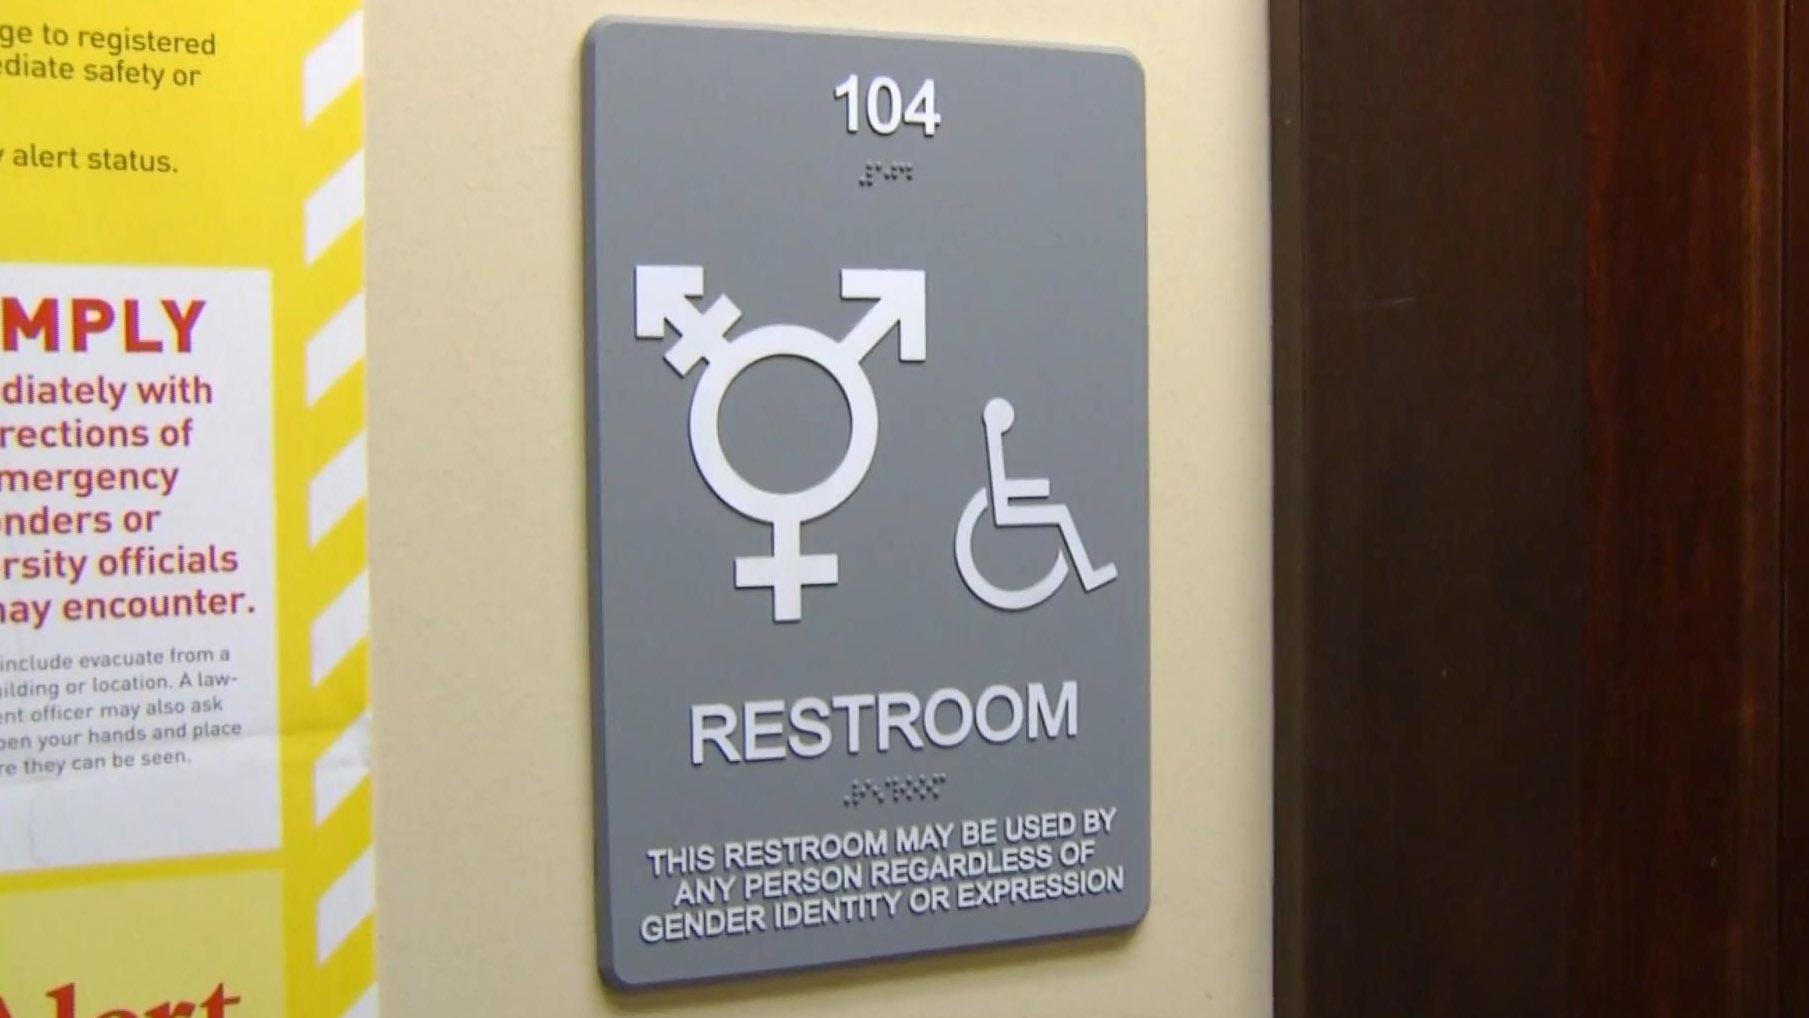 transgender bathroom use debates play out across u.s. - cbs news